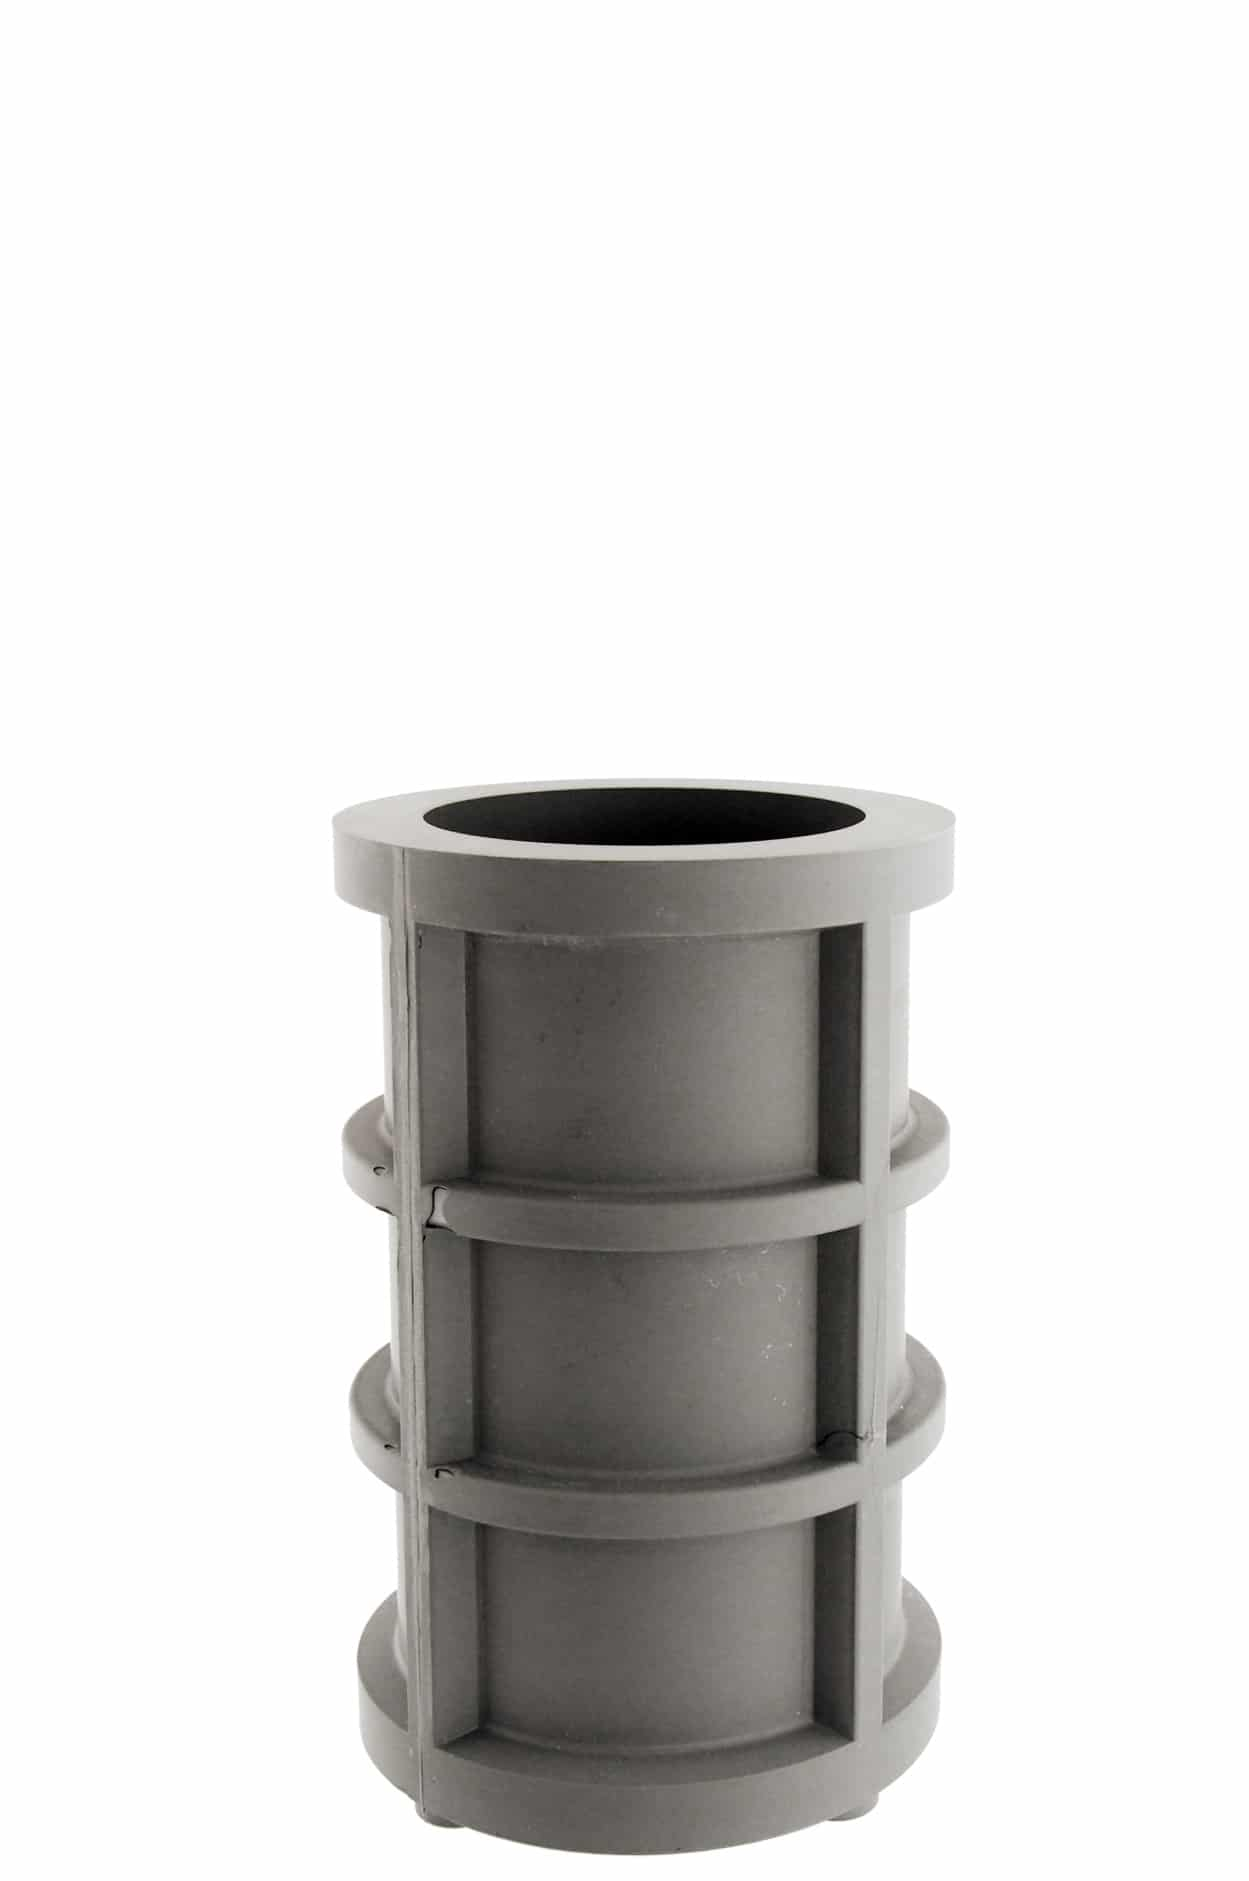 cubiera-cilindrica-1020